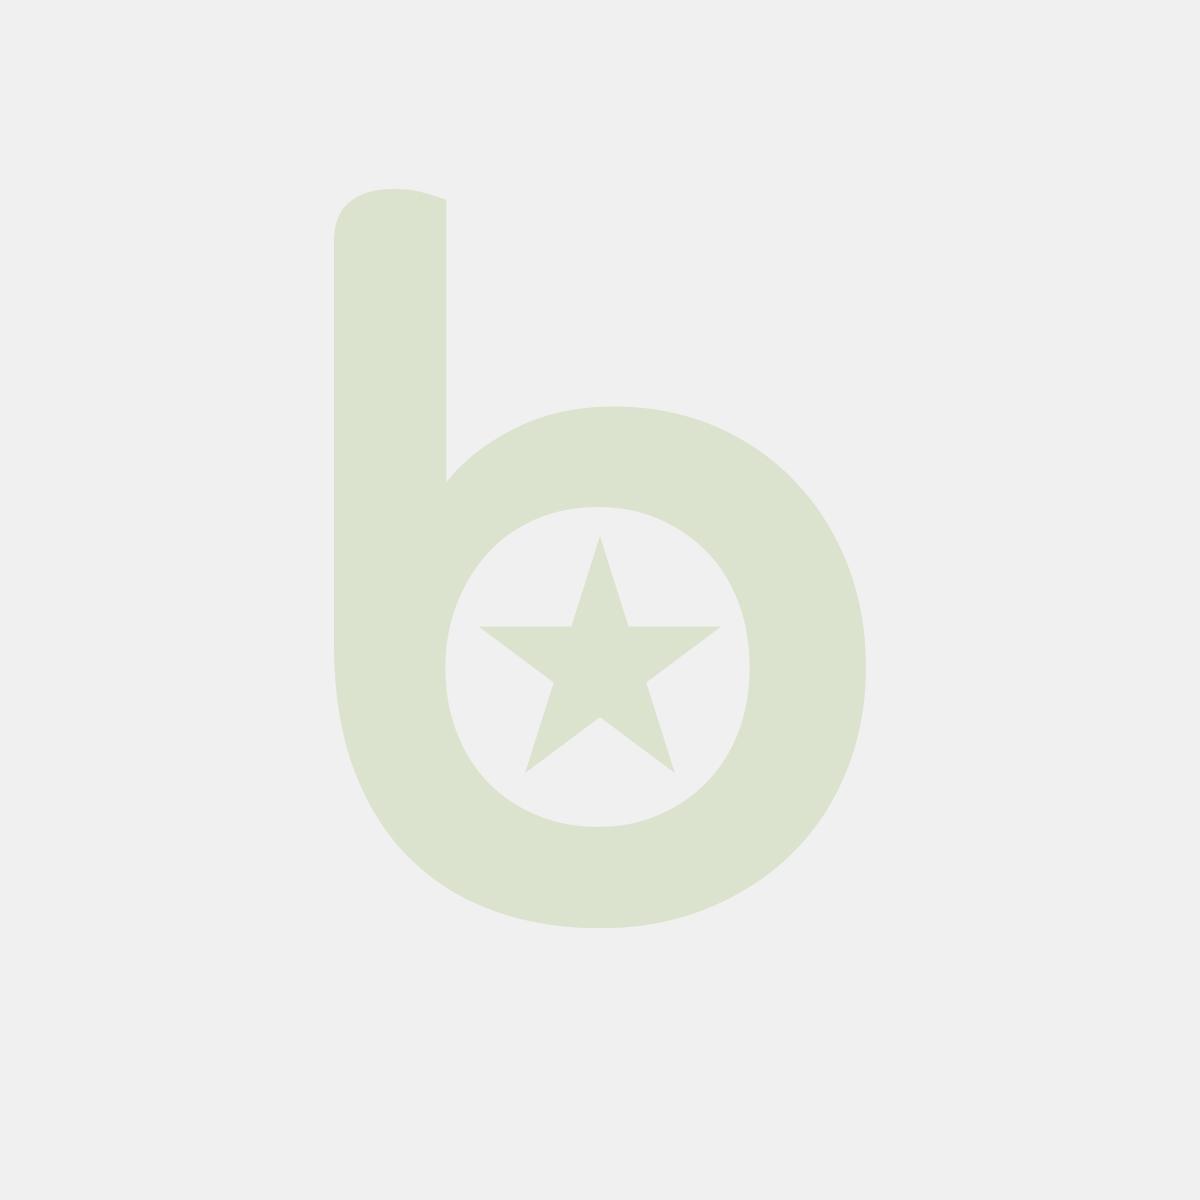 Notatnik SIGEL Conceptum® okładka filc, A5, w linie, szary